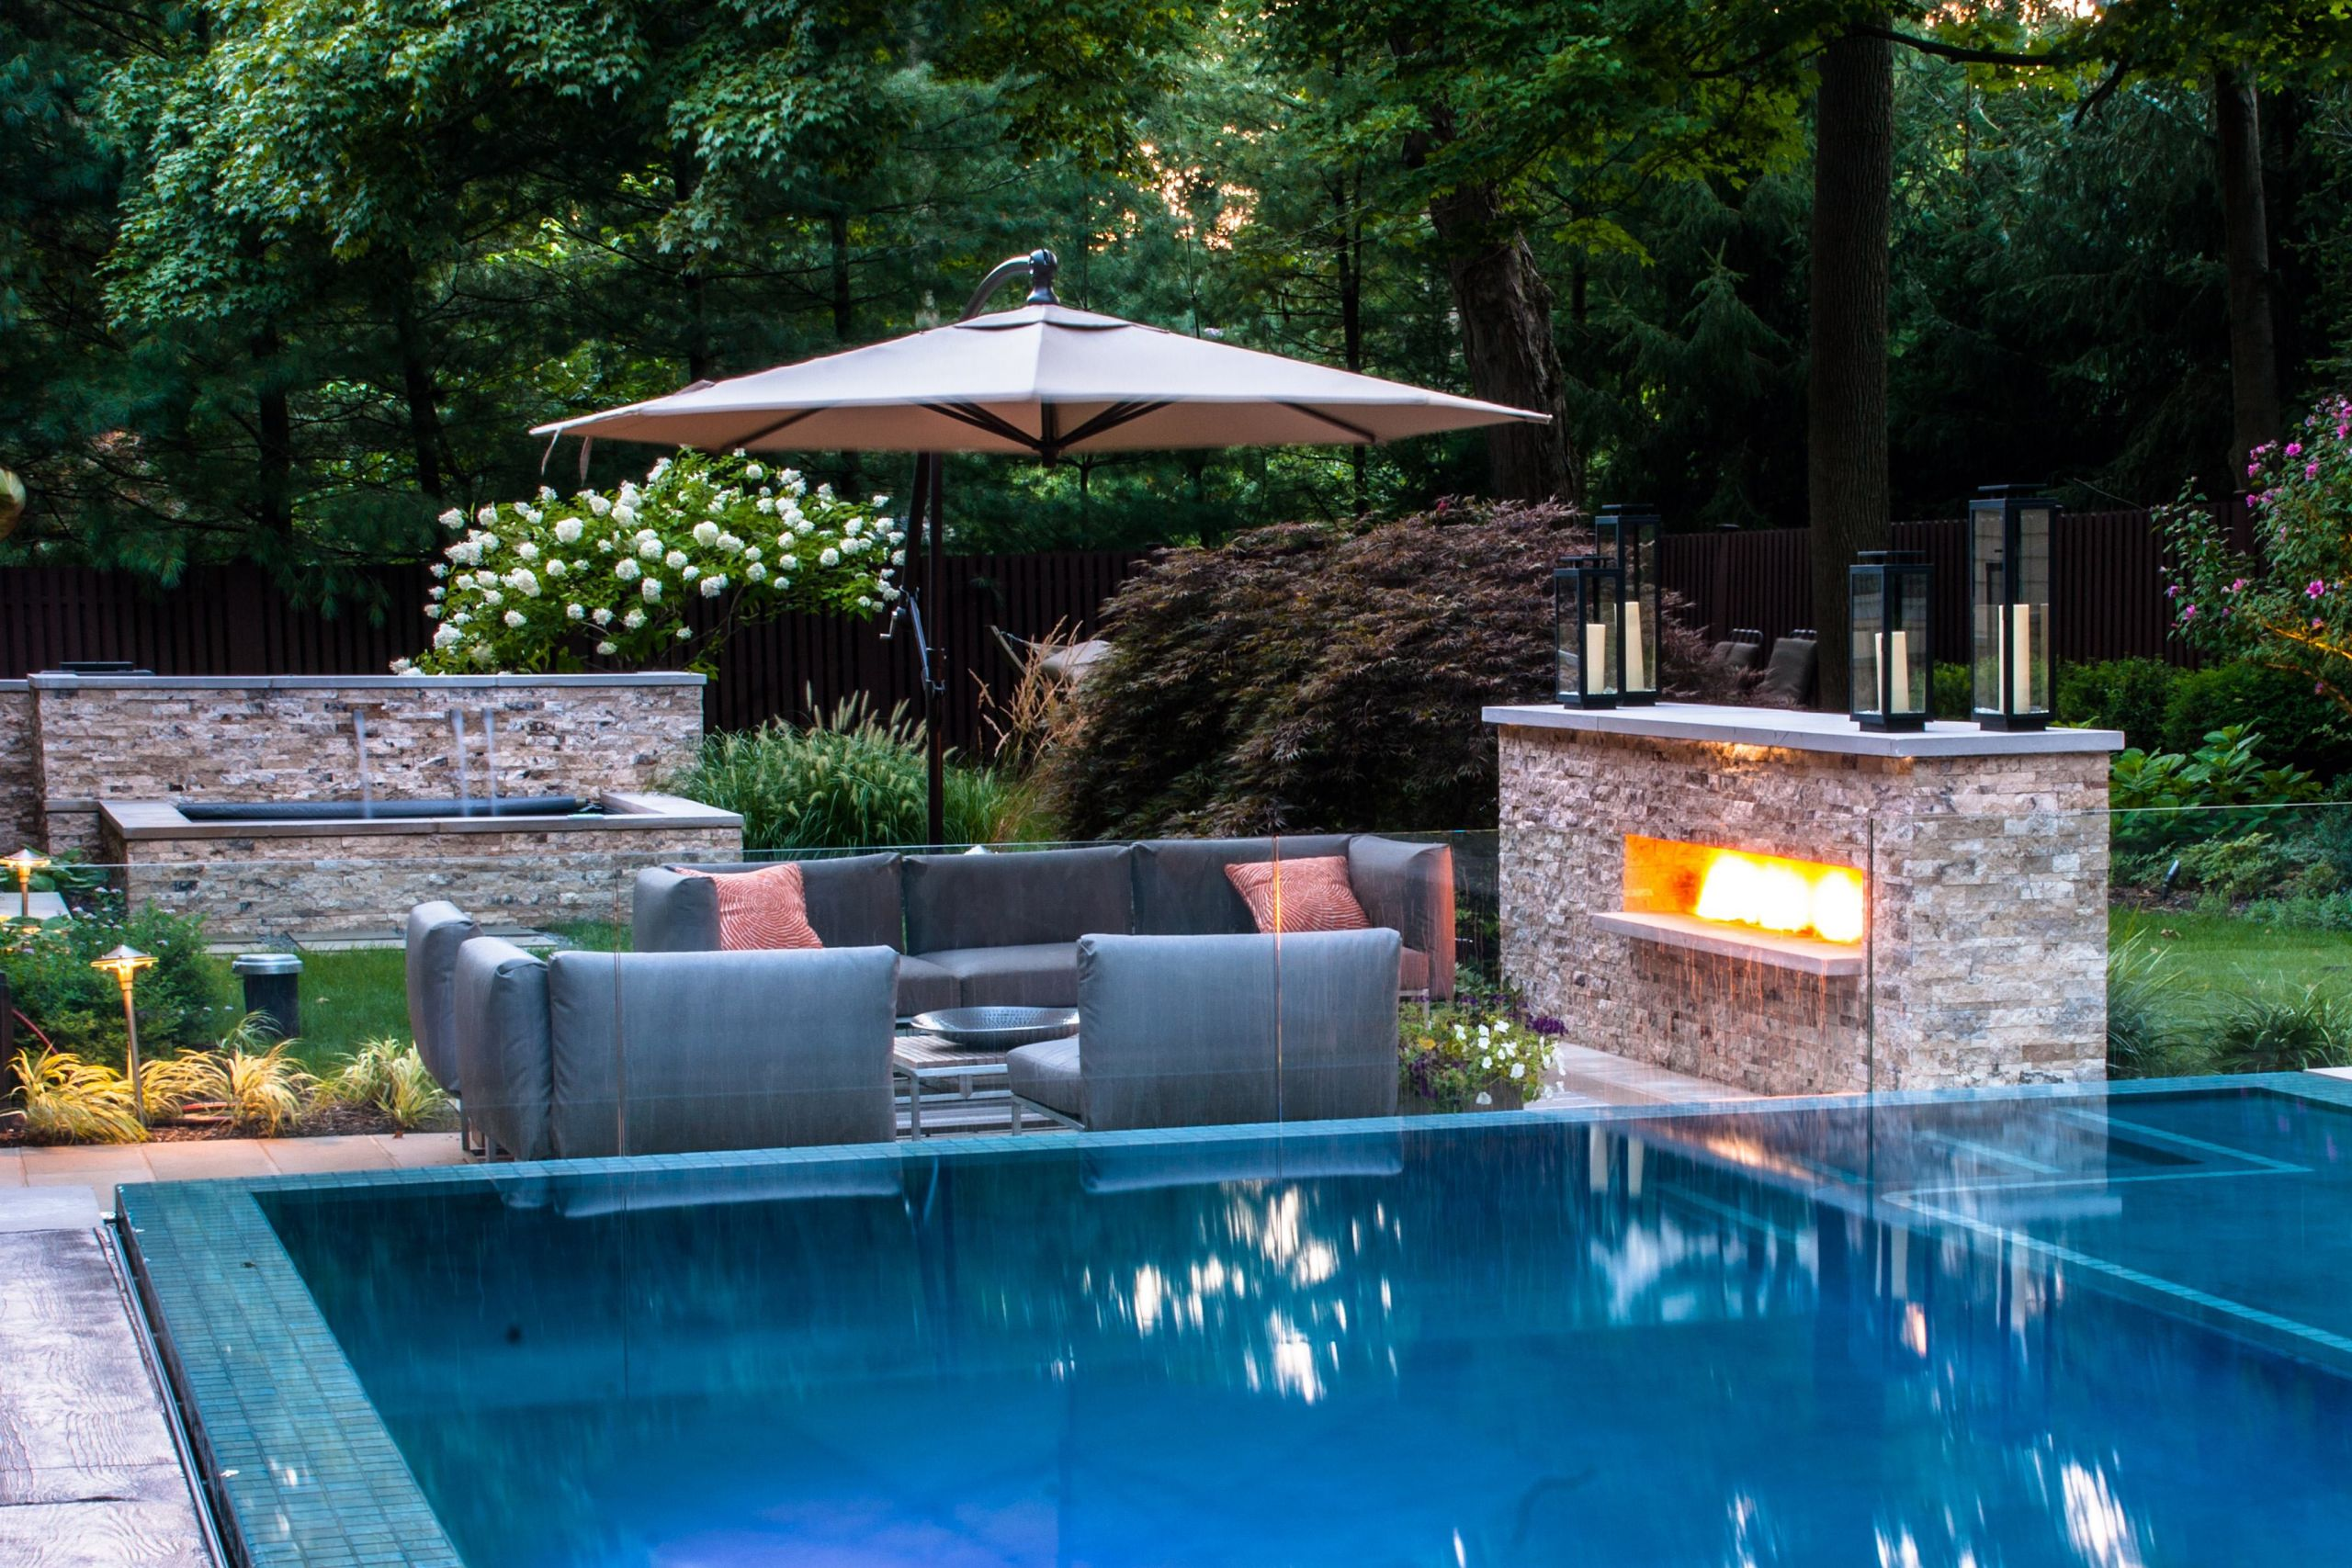 Outdoor Landscape Pool  Bergen County NJ Pool & Landscaping Ideas Wins pany Awards